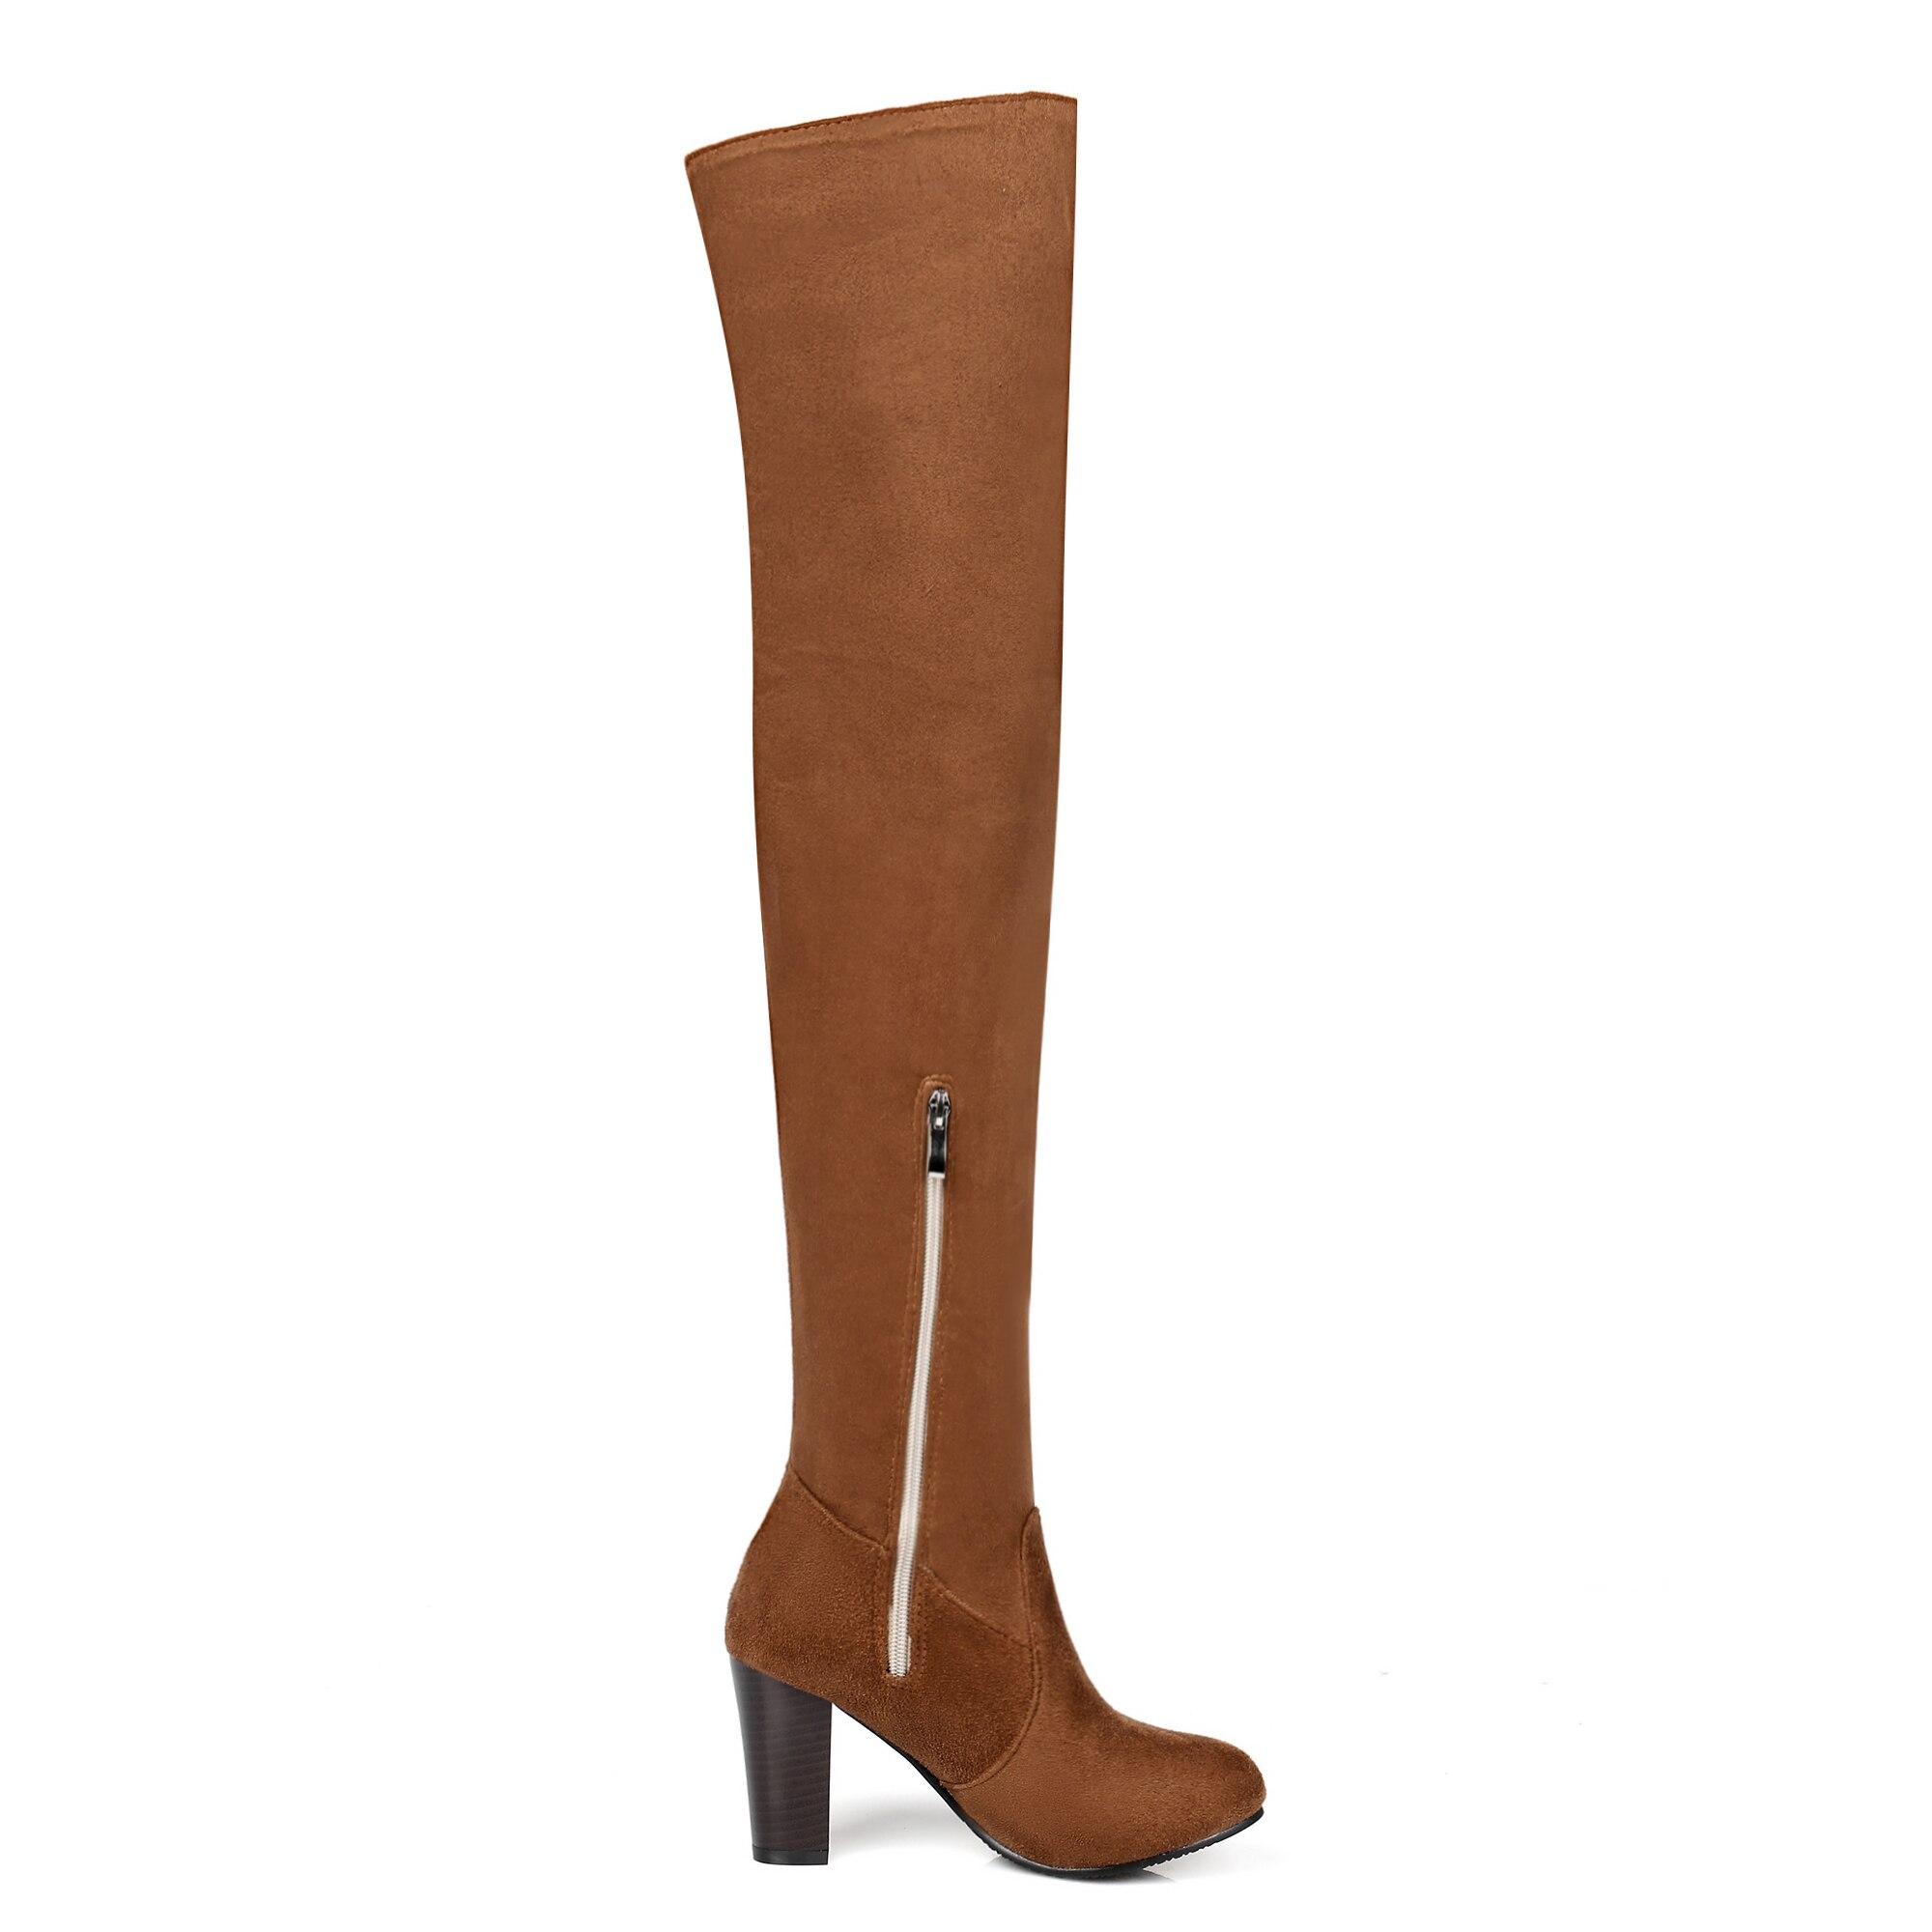 Sexy Zapatos Botas Qzyerai marrón Cálido Rodilla Casual Invierno Moda Tapered Para Señora Negro Mujer wY8rYzqH